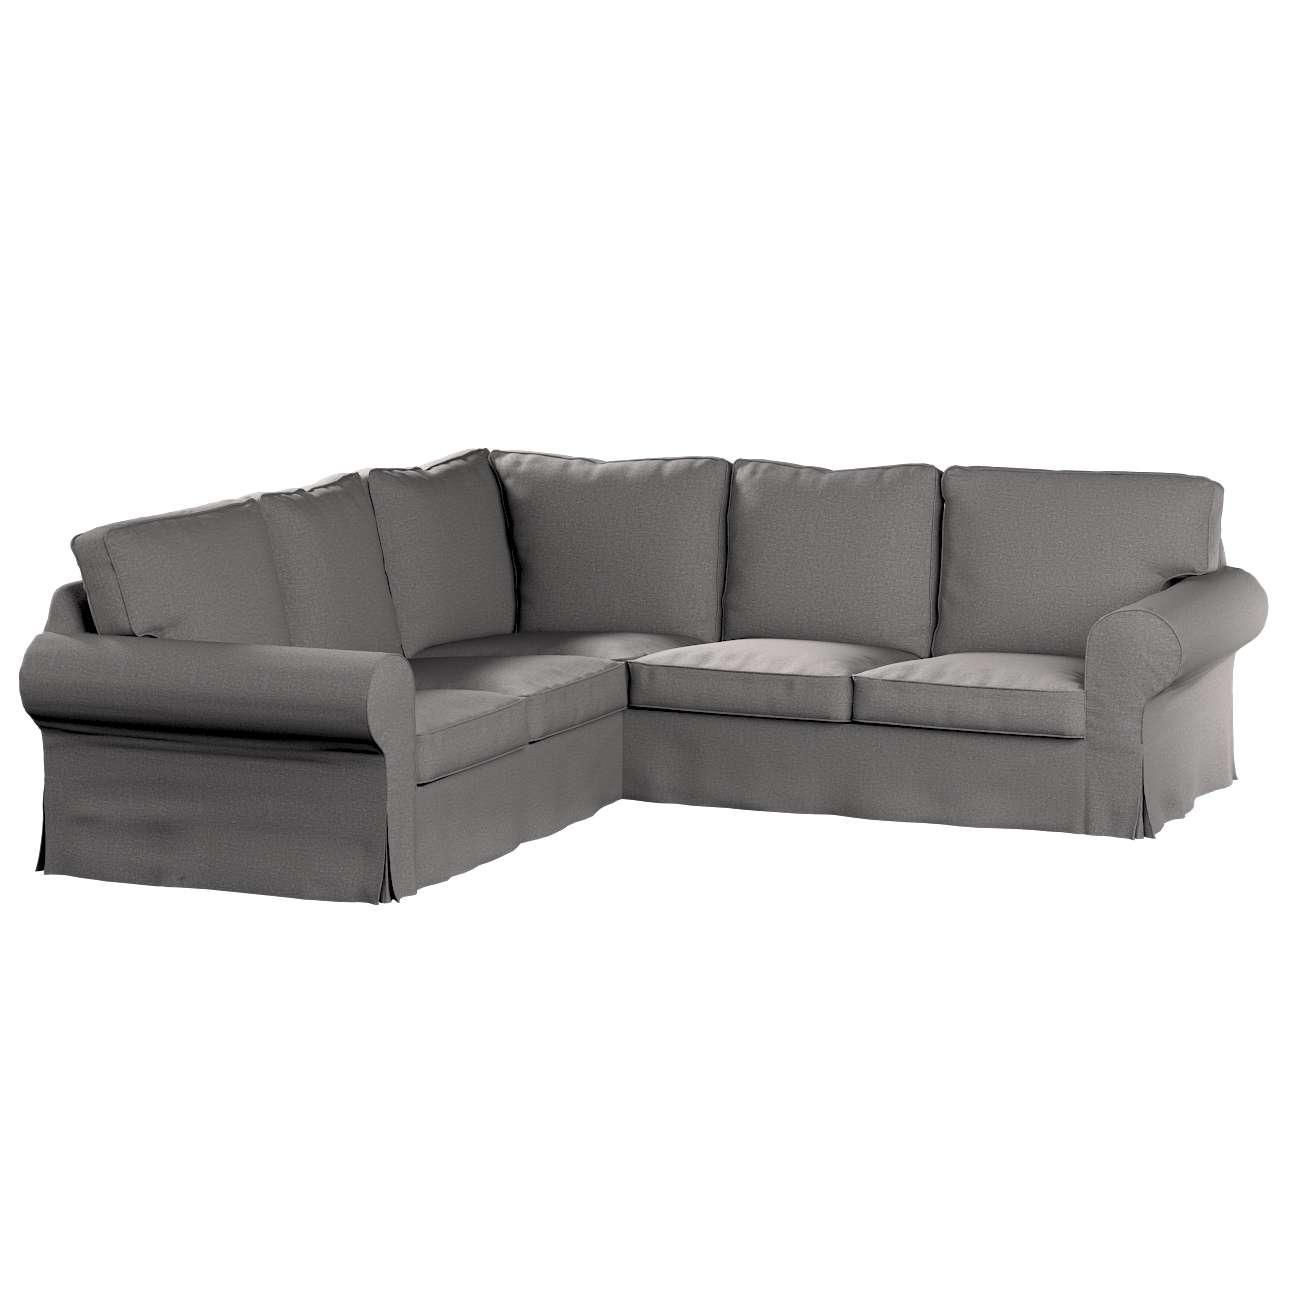 Ektorp kampinė sofa Ektorp kampinė sofa kolekcijoje Edinburgh , audinys: 115-81